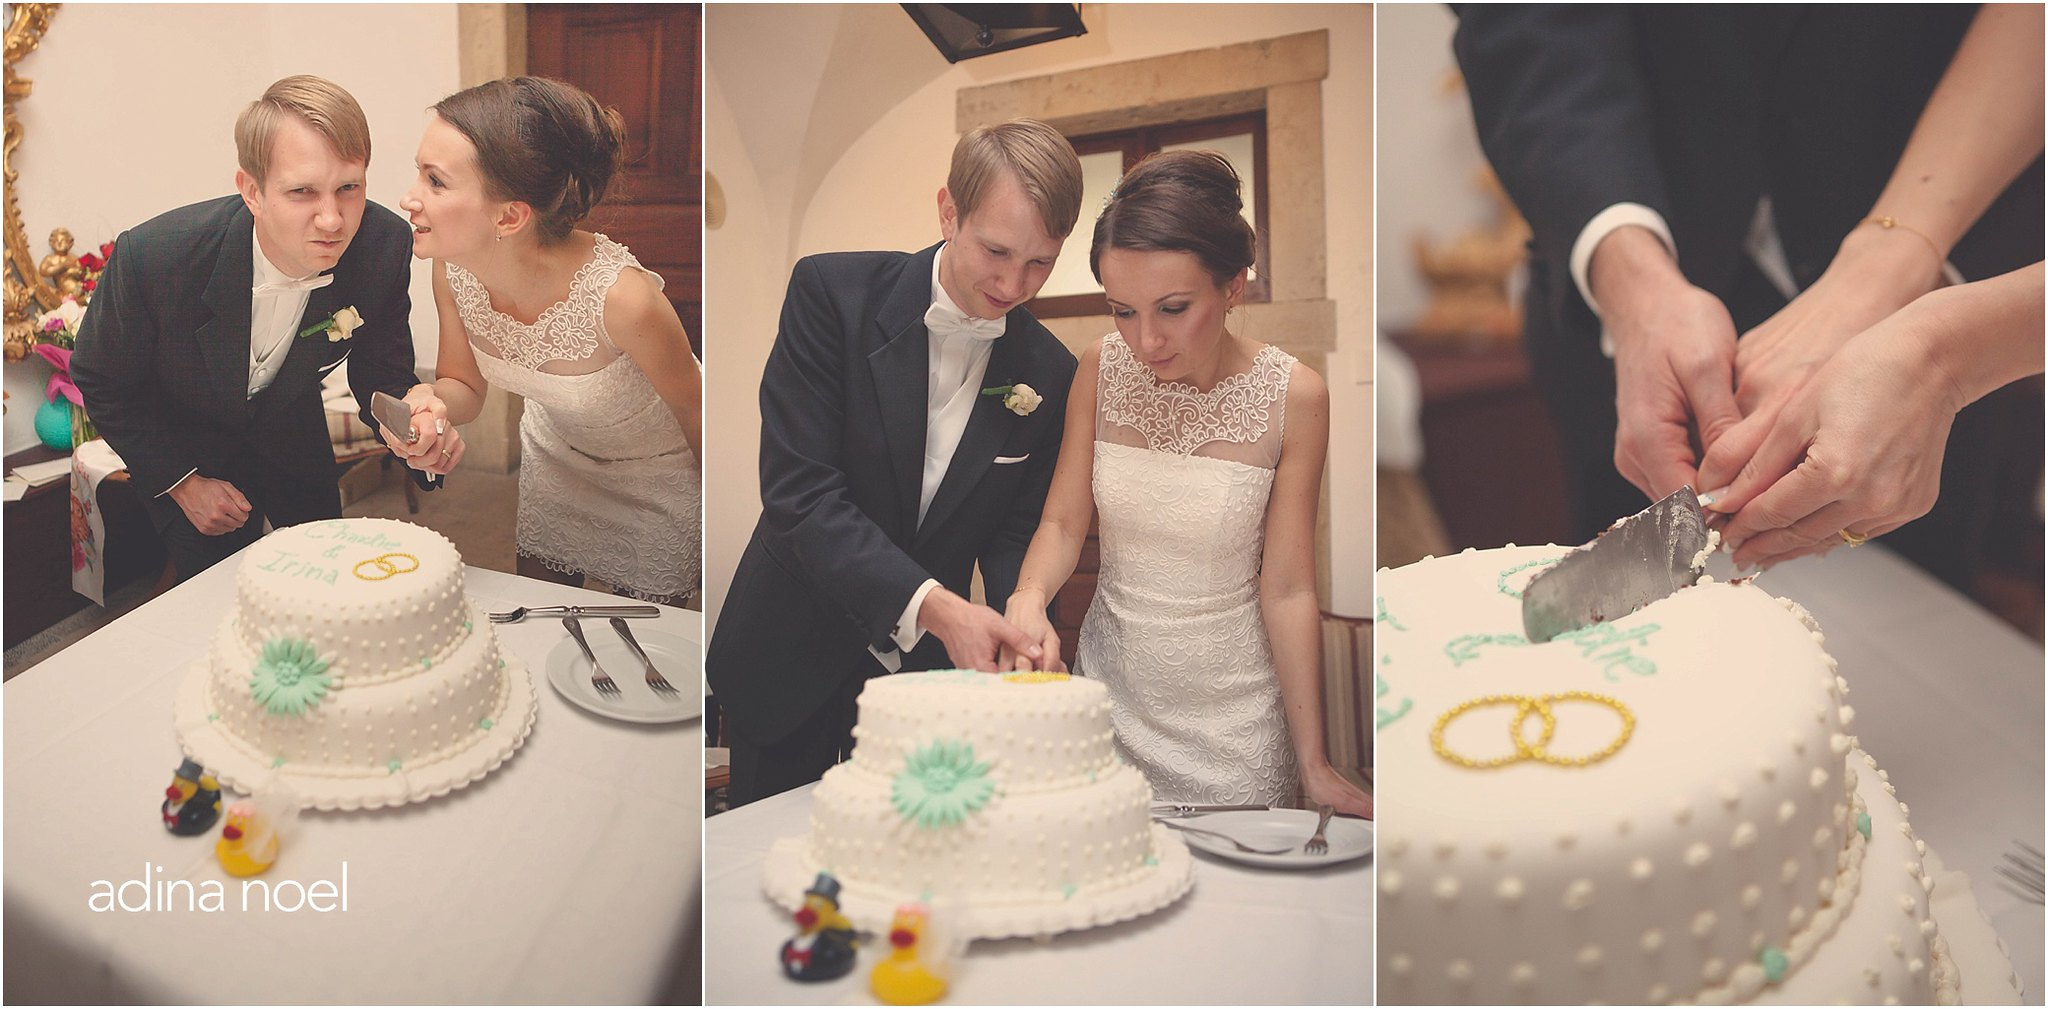 Stachour-Wedding 370_WEB